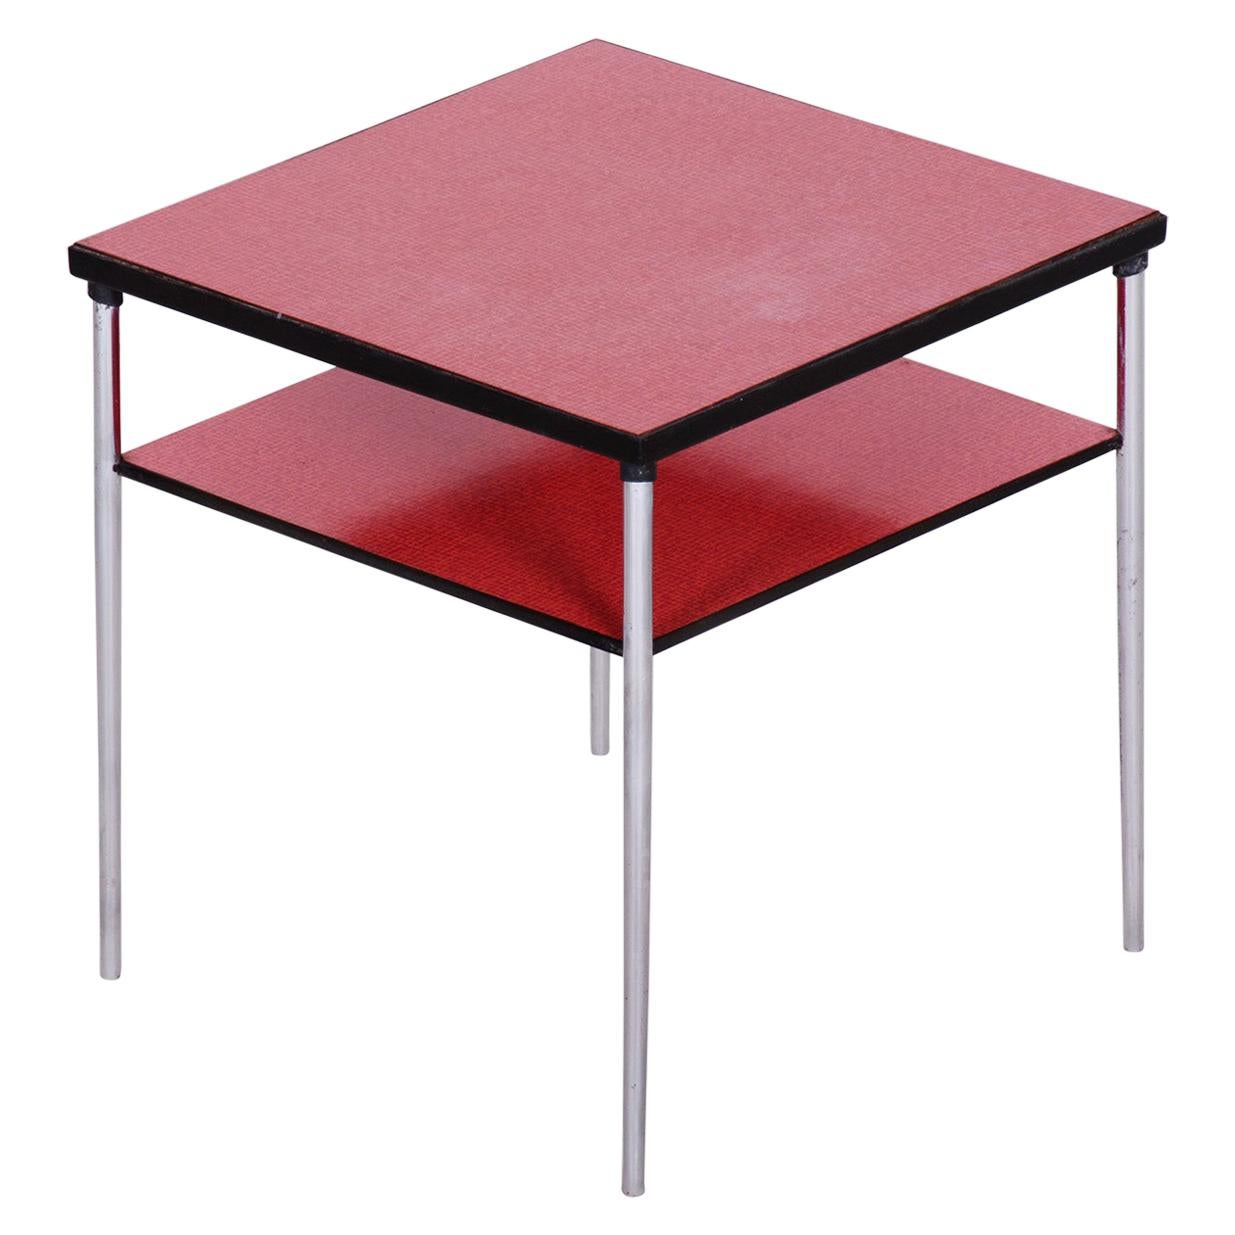 20th Century Czech Square Umakart Bauhaus Table, Chrome-Plated Steel, 1930s